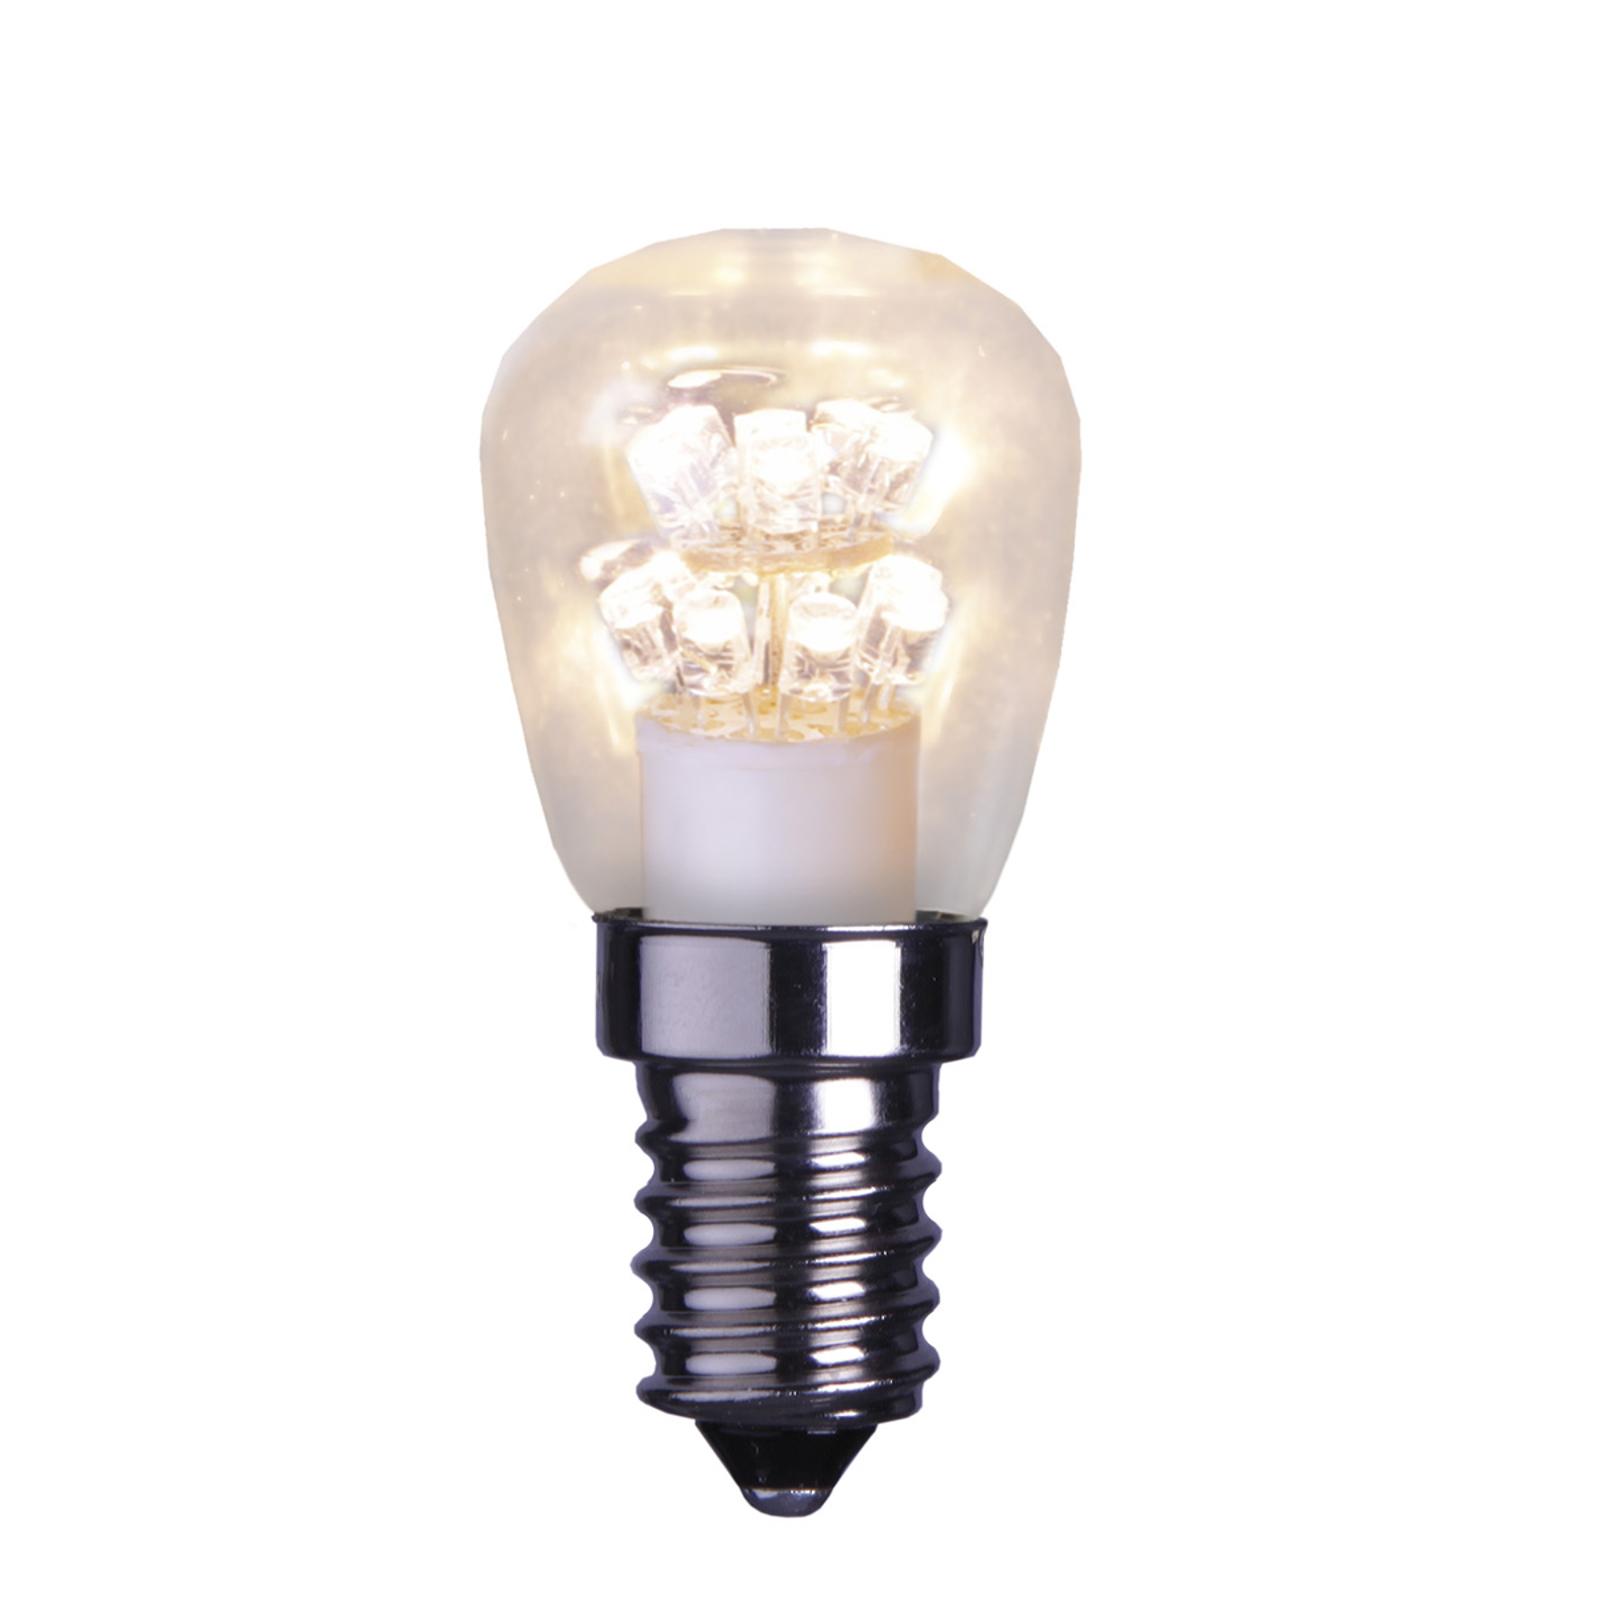 Transparant E14-ledlampje van 0,7W, warmwit